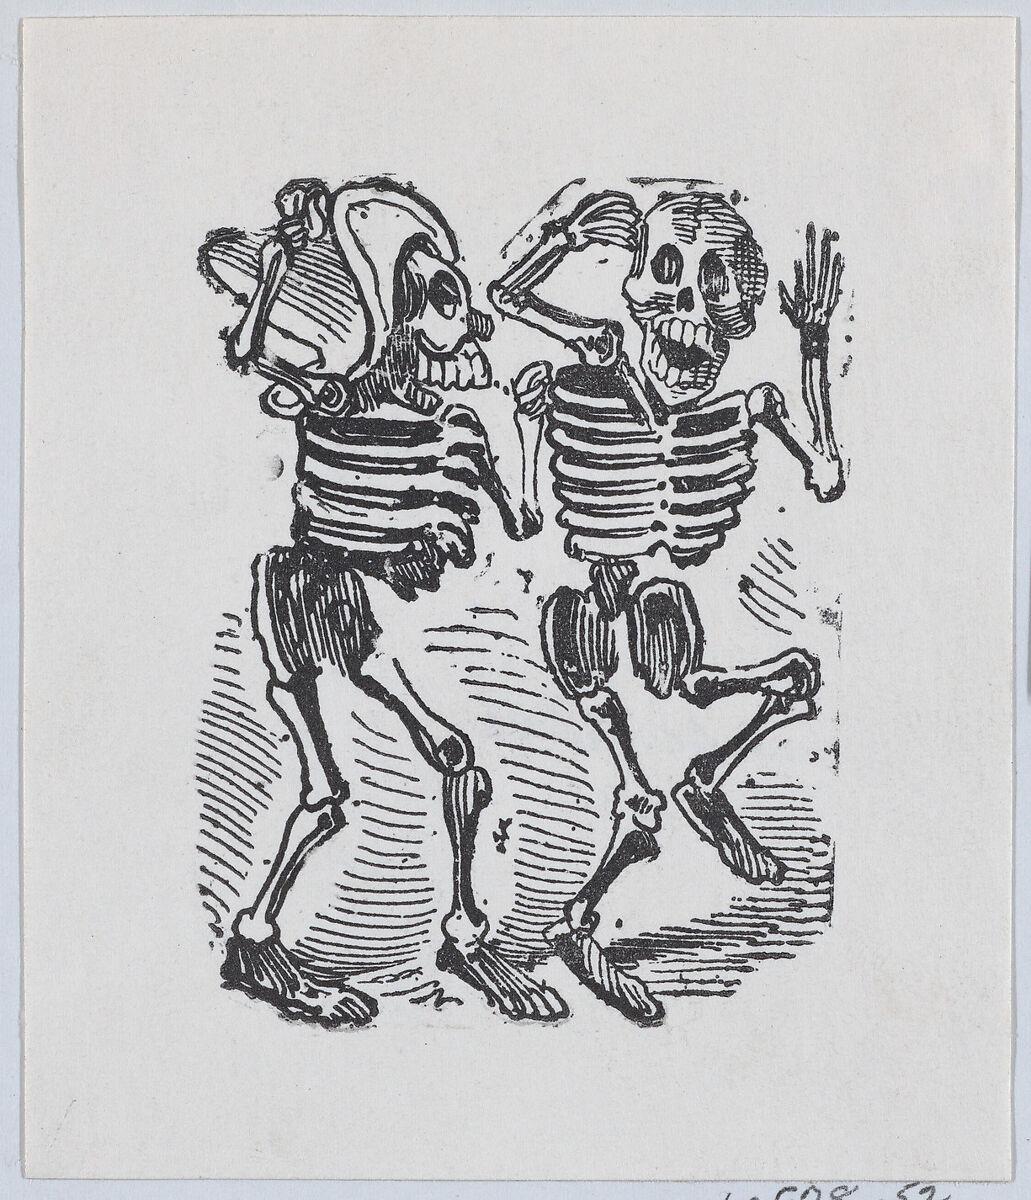 José Guadalupe Posada | Two skeletons smiling and dancing | The Met